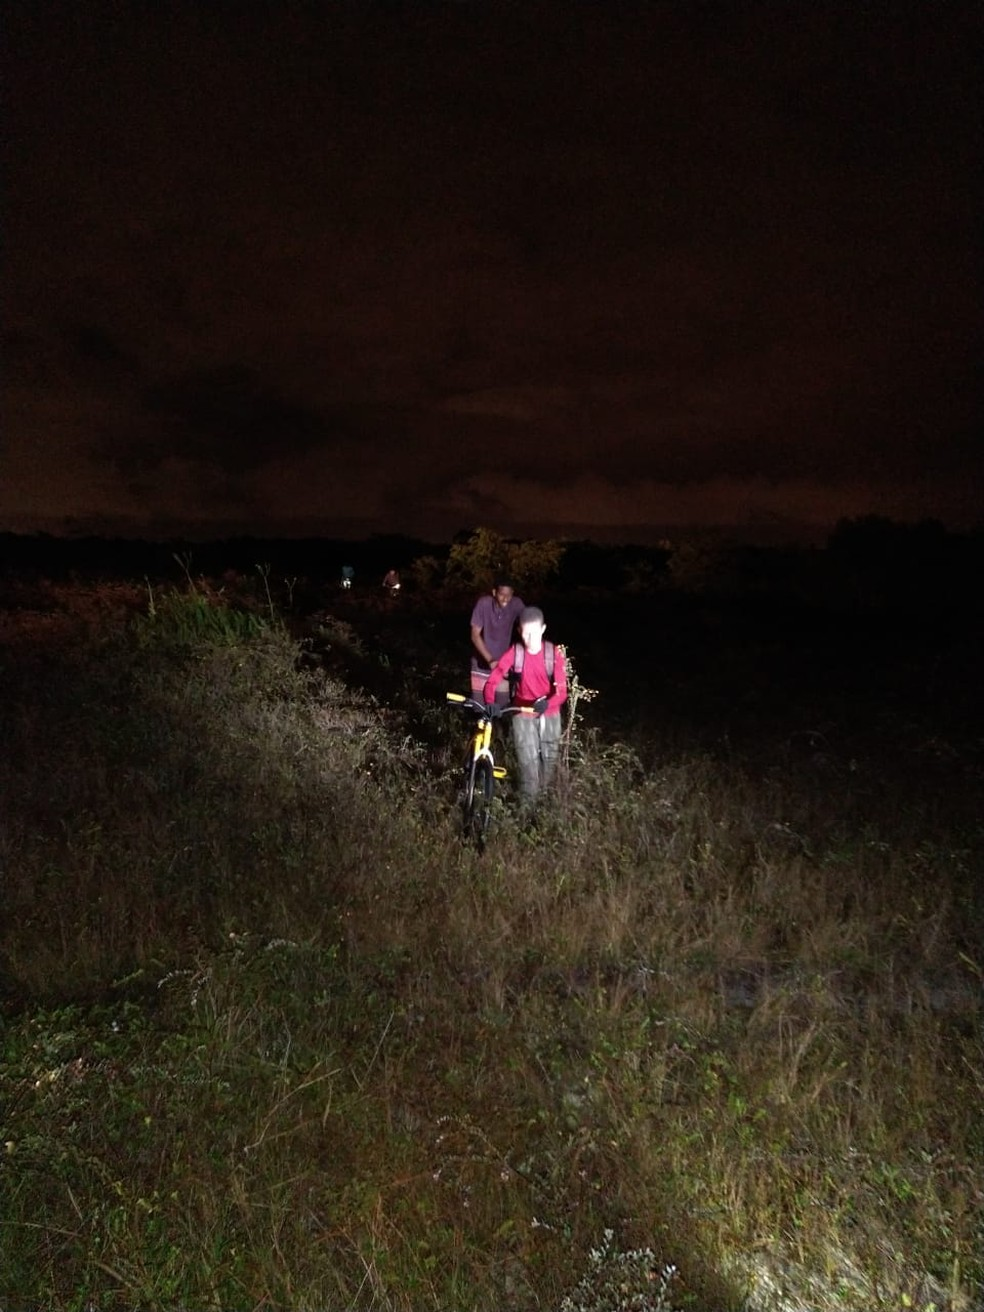 Jovens foram gravar vídeo na Caverna da Onça, na zona rural de Santa Rita, na PB — Foto: Anderson Pereira/Corpo de Bombeiros da Paraíba